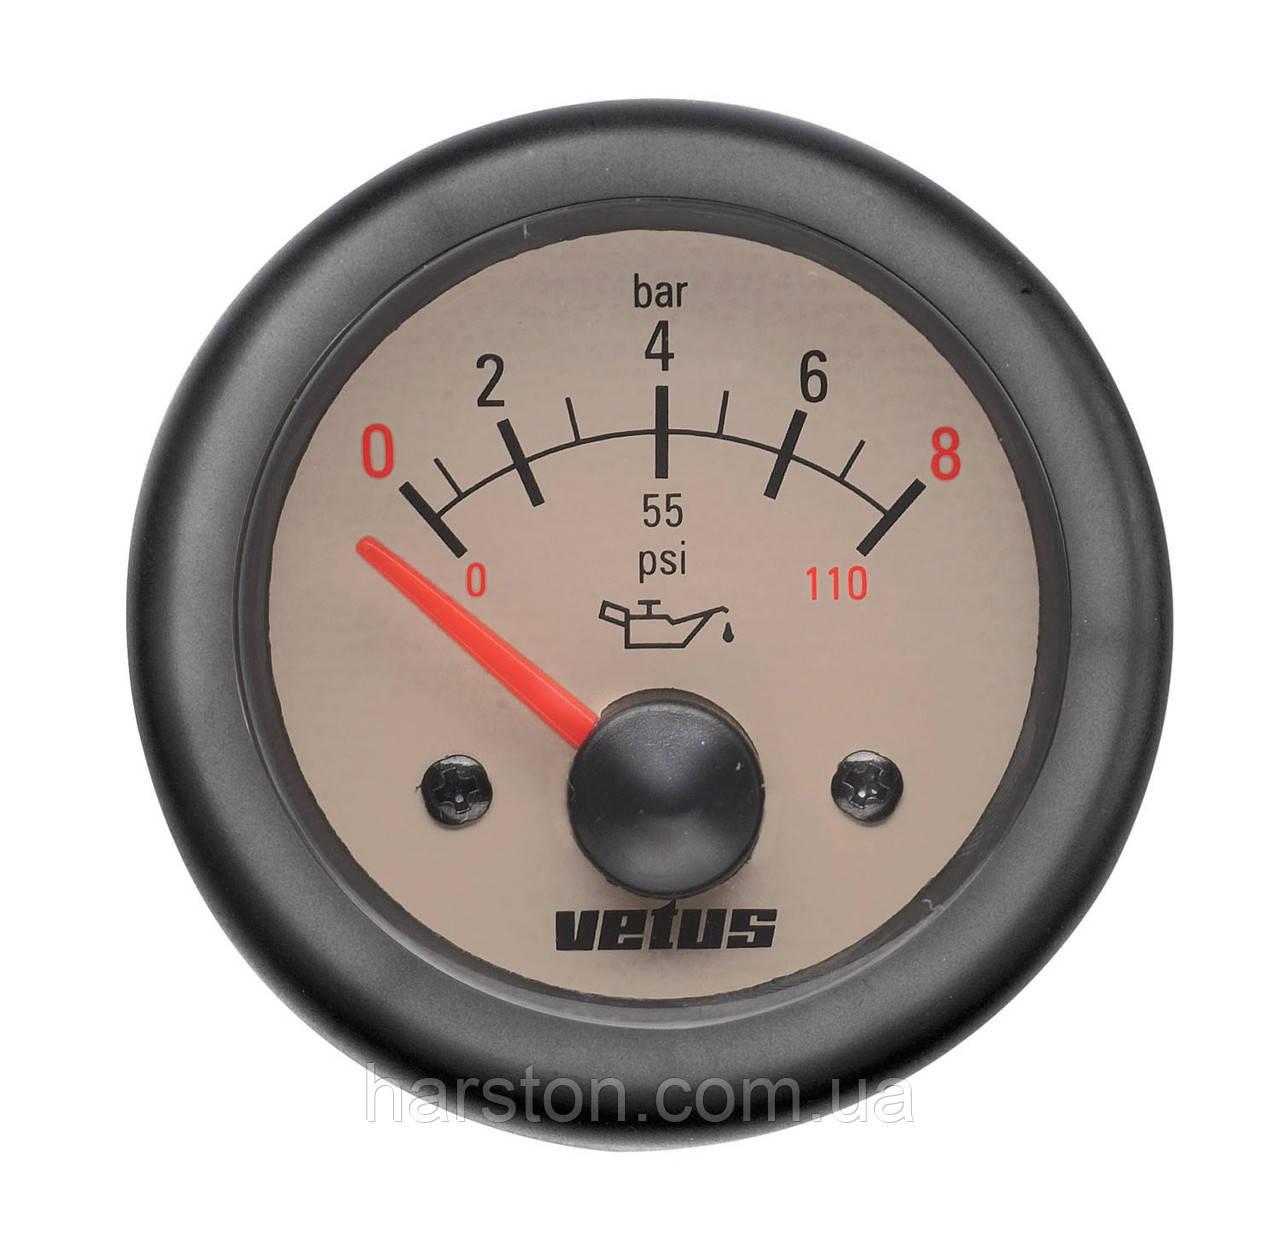 Индикатор давления масла VETUS OIL12W (OIL24W)